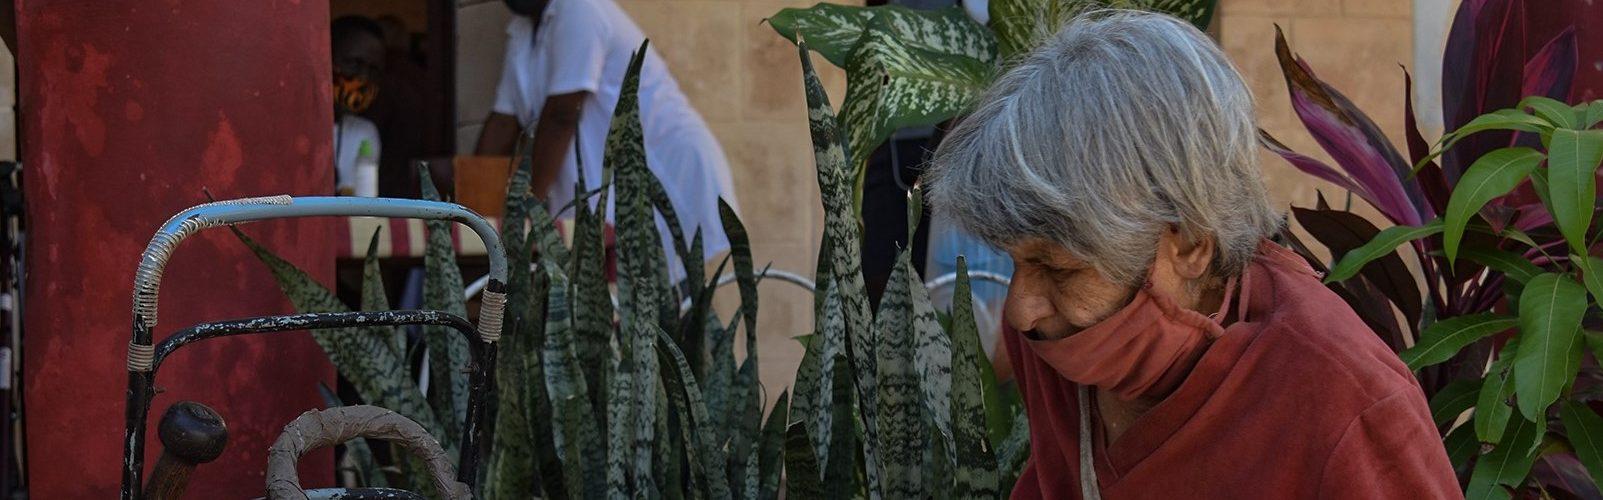 Foto: Thalía Alfonso Gómez